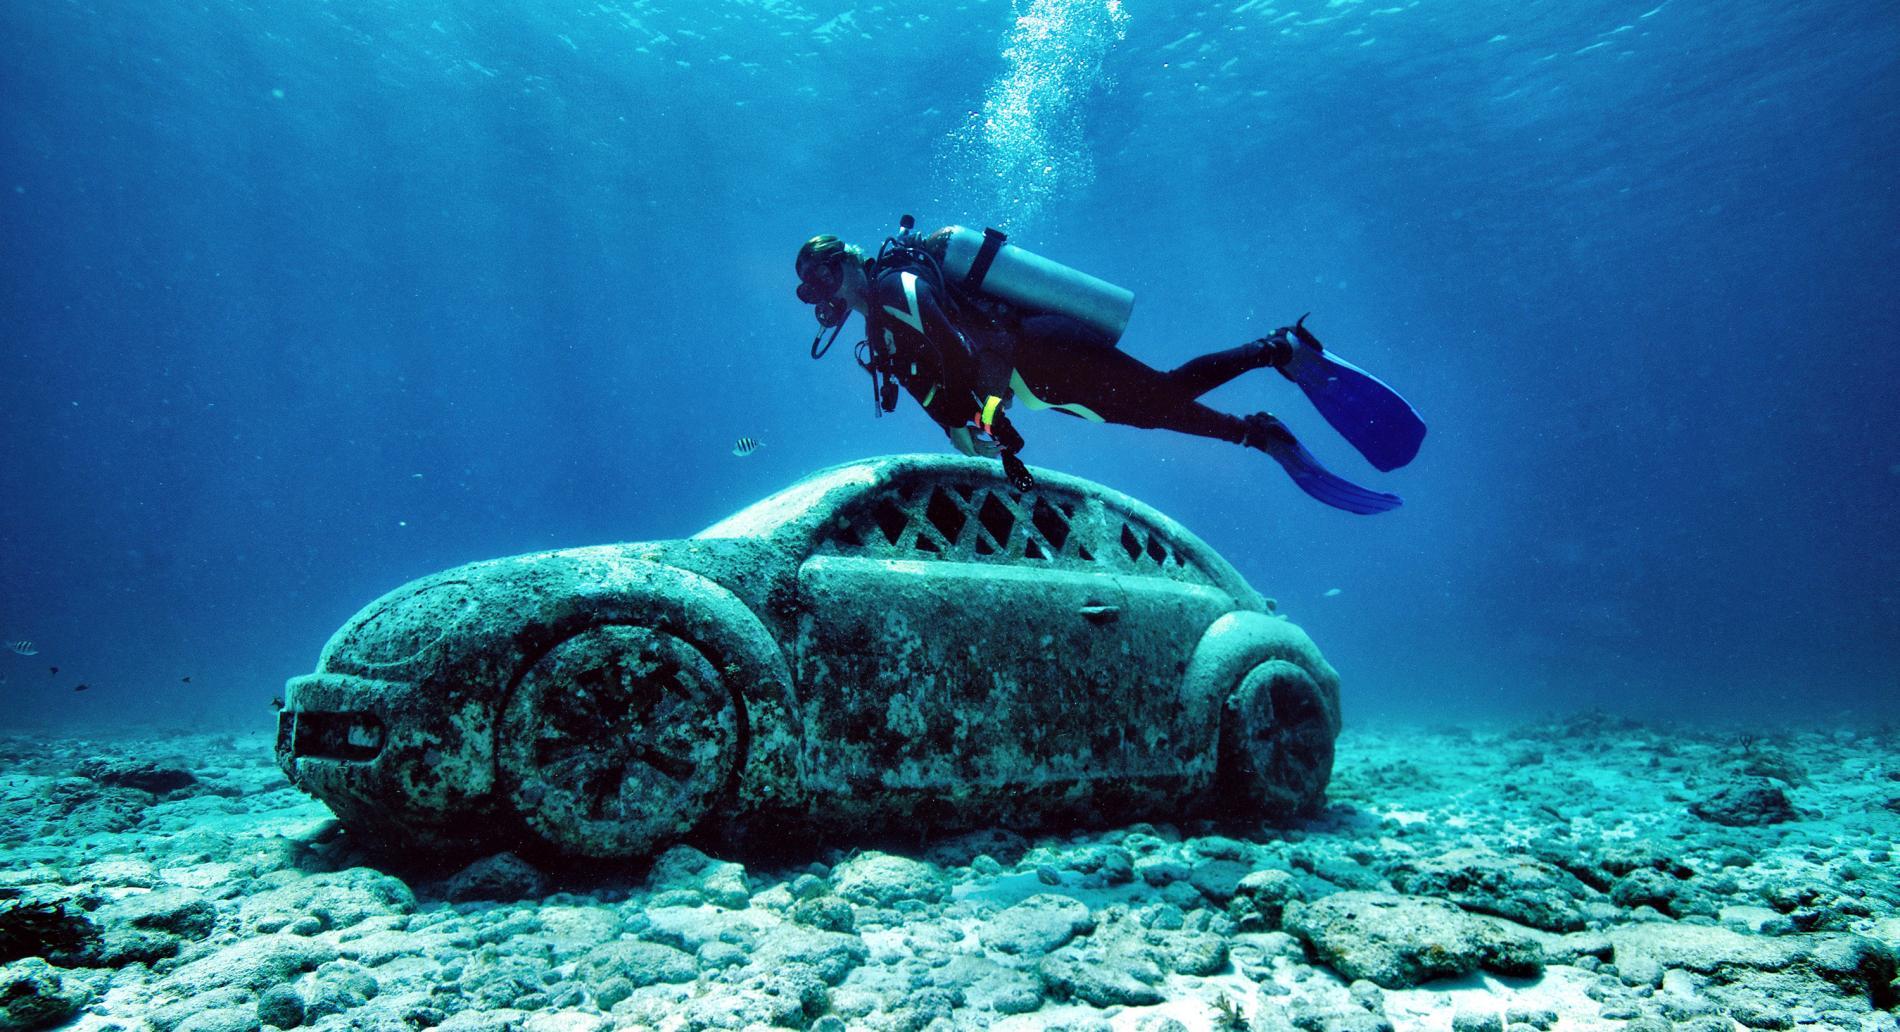 car-underwater-art-museum-cancun-mexico.ngsversion.1488994206830.adapt.1900.1.jpg